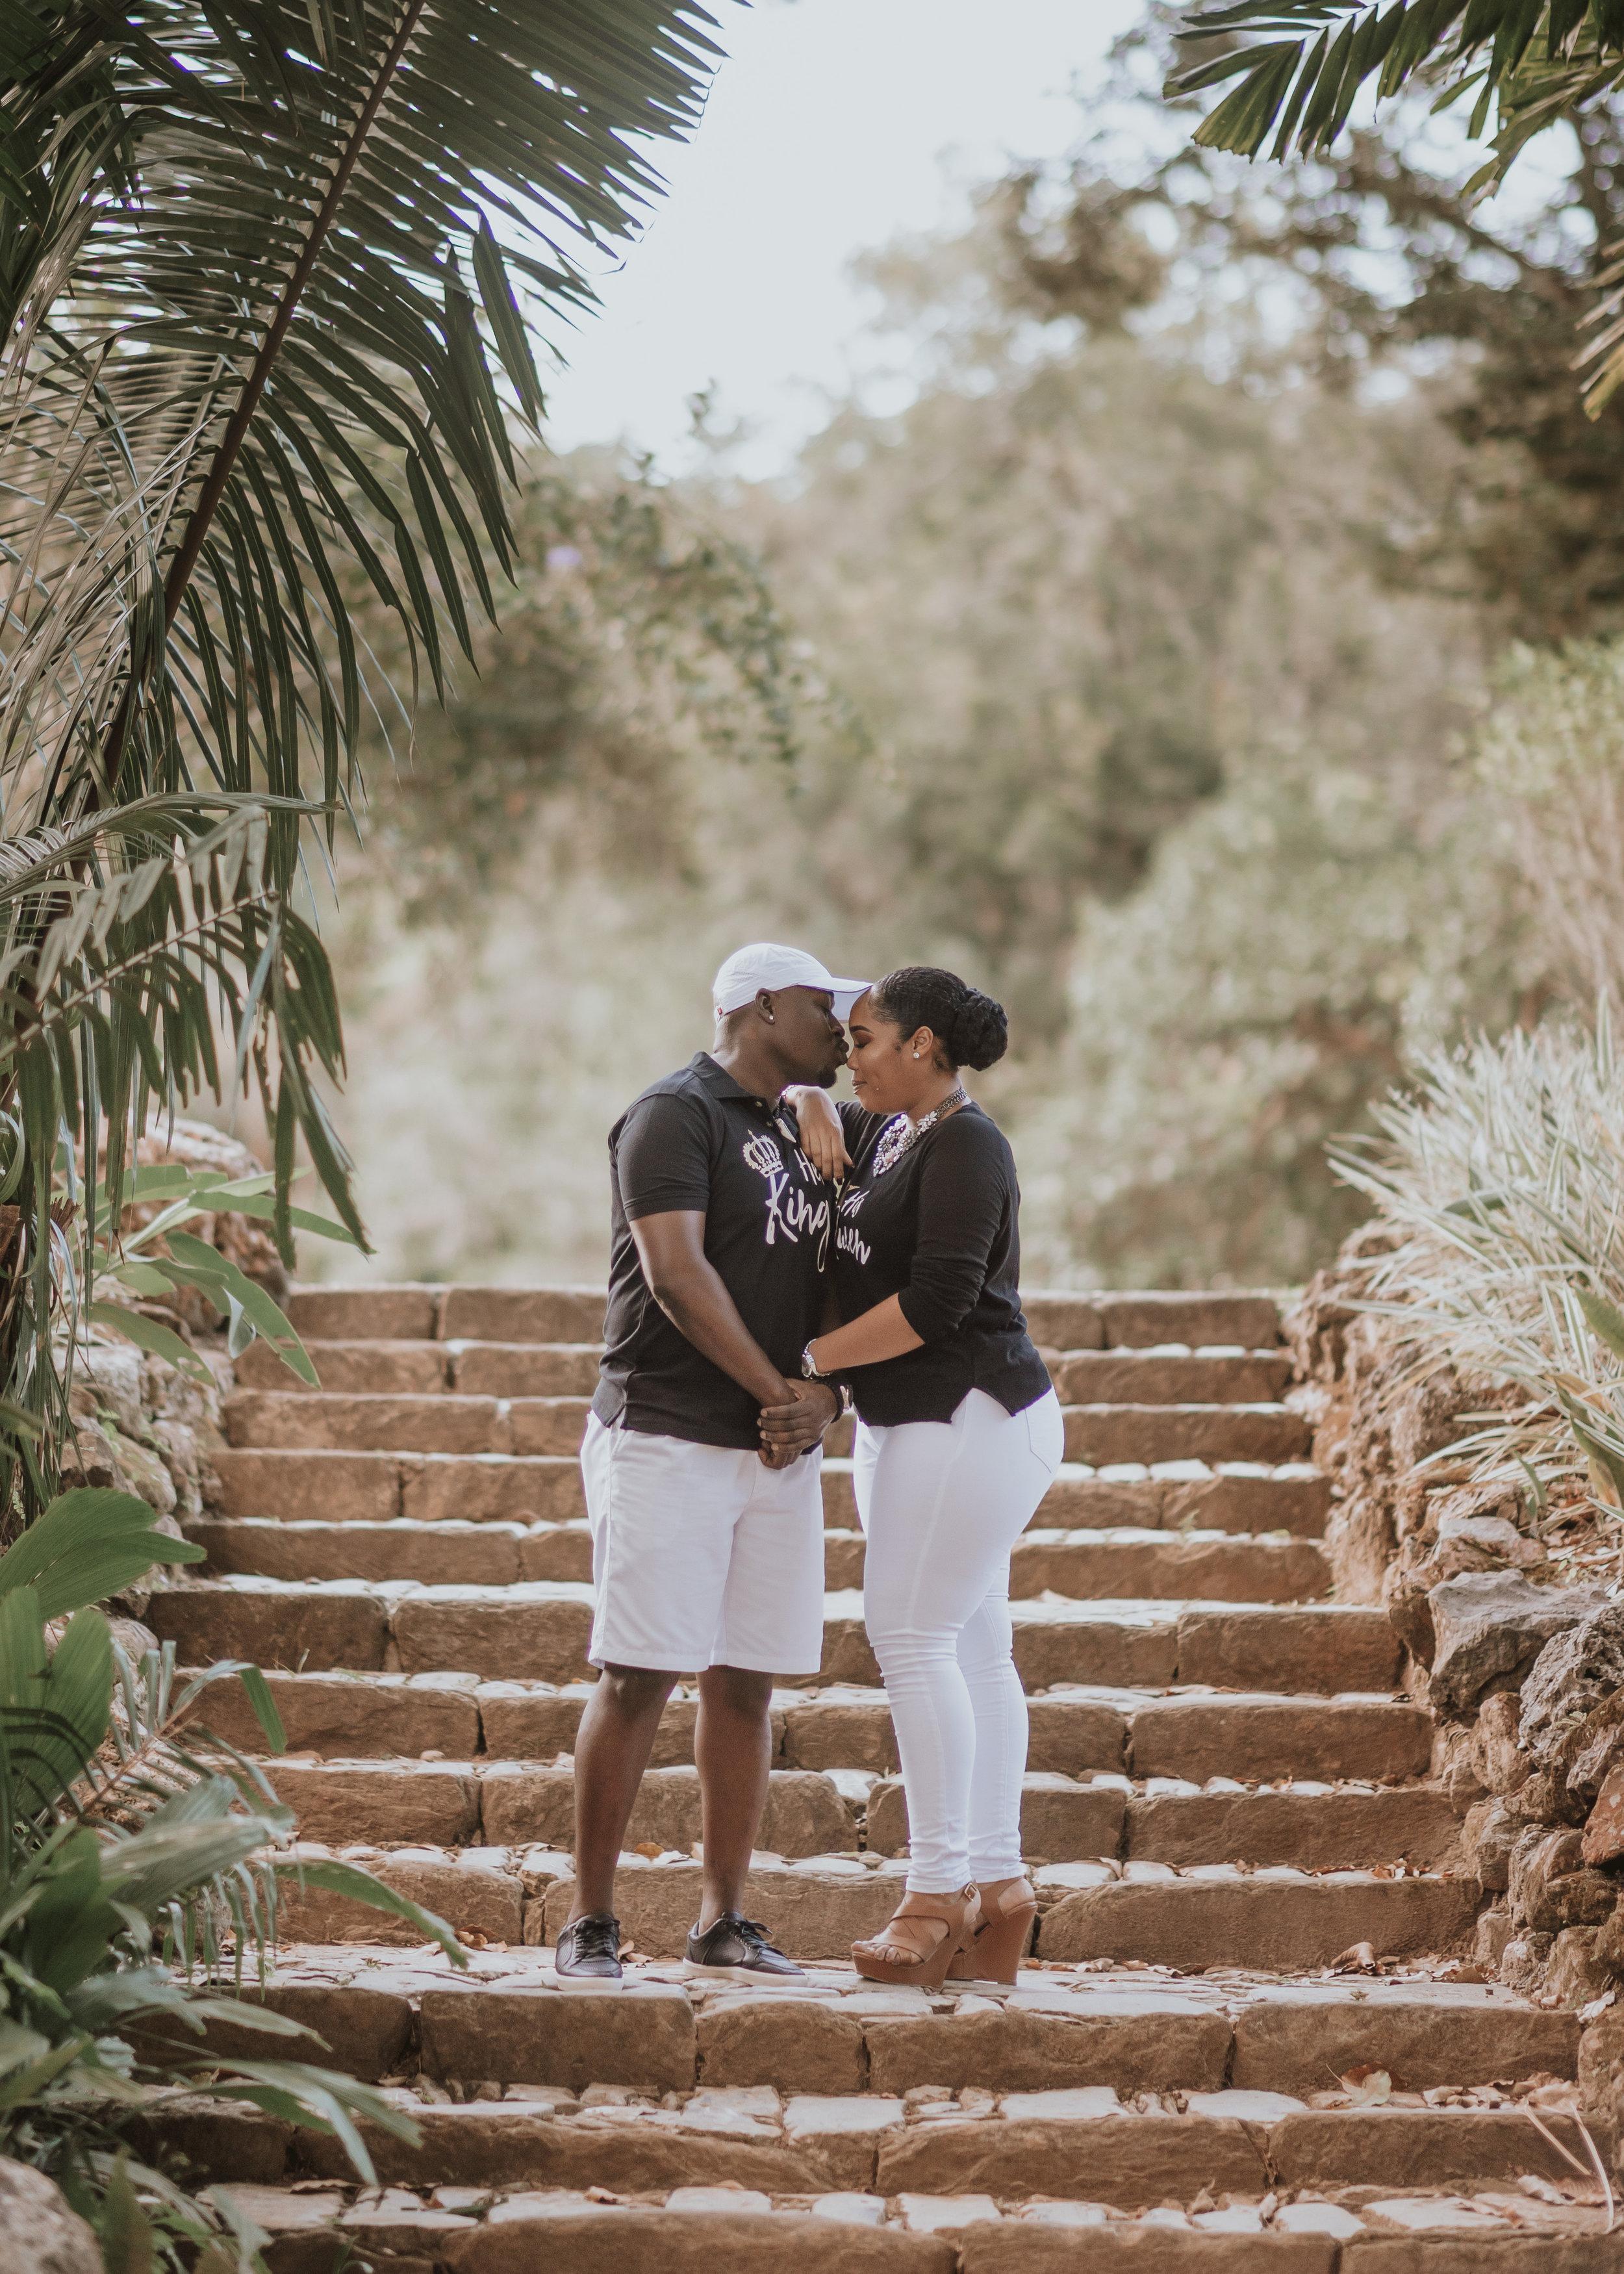 Teheila & Dominic Engagement-26.jpg